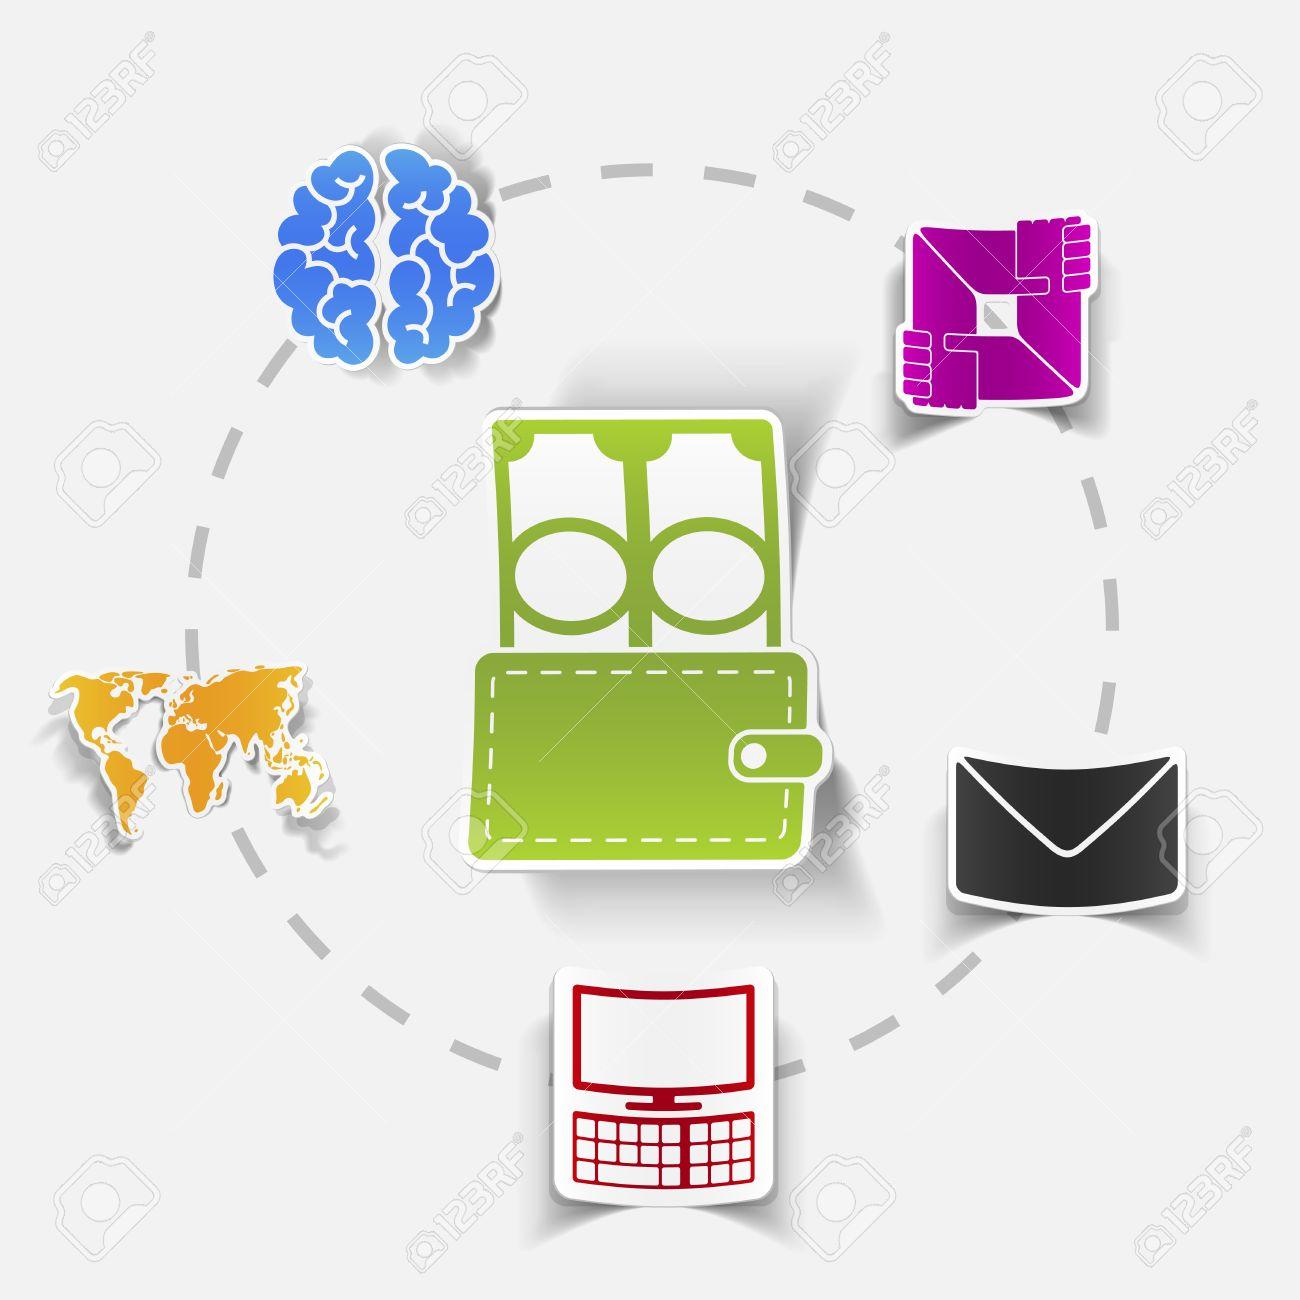 Social Concept: Envelope, Computer, Brain, Wallet, Money, Map.